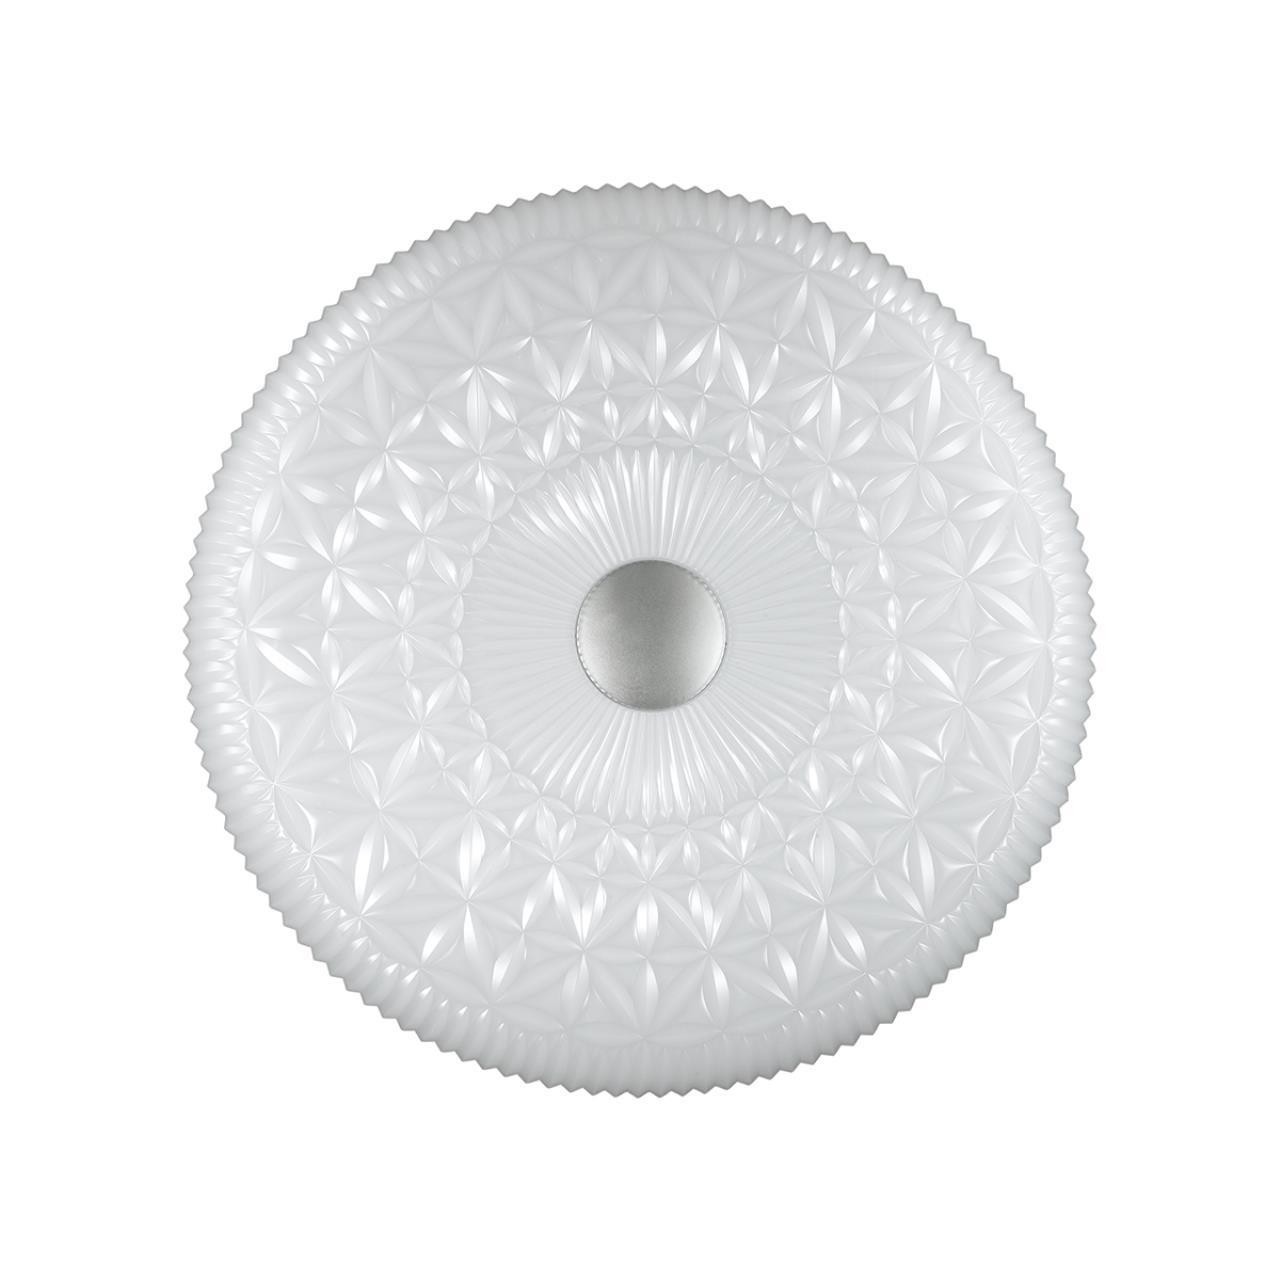 2086/DL SN 059 св-к KARIDA пластик LED 48Вт 3000-6000K D400 IP43 пульт ДУ